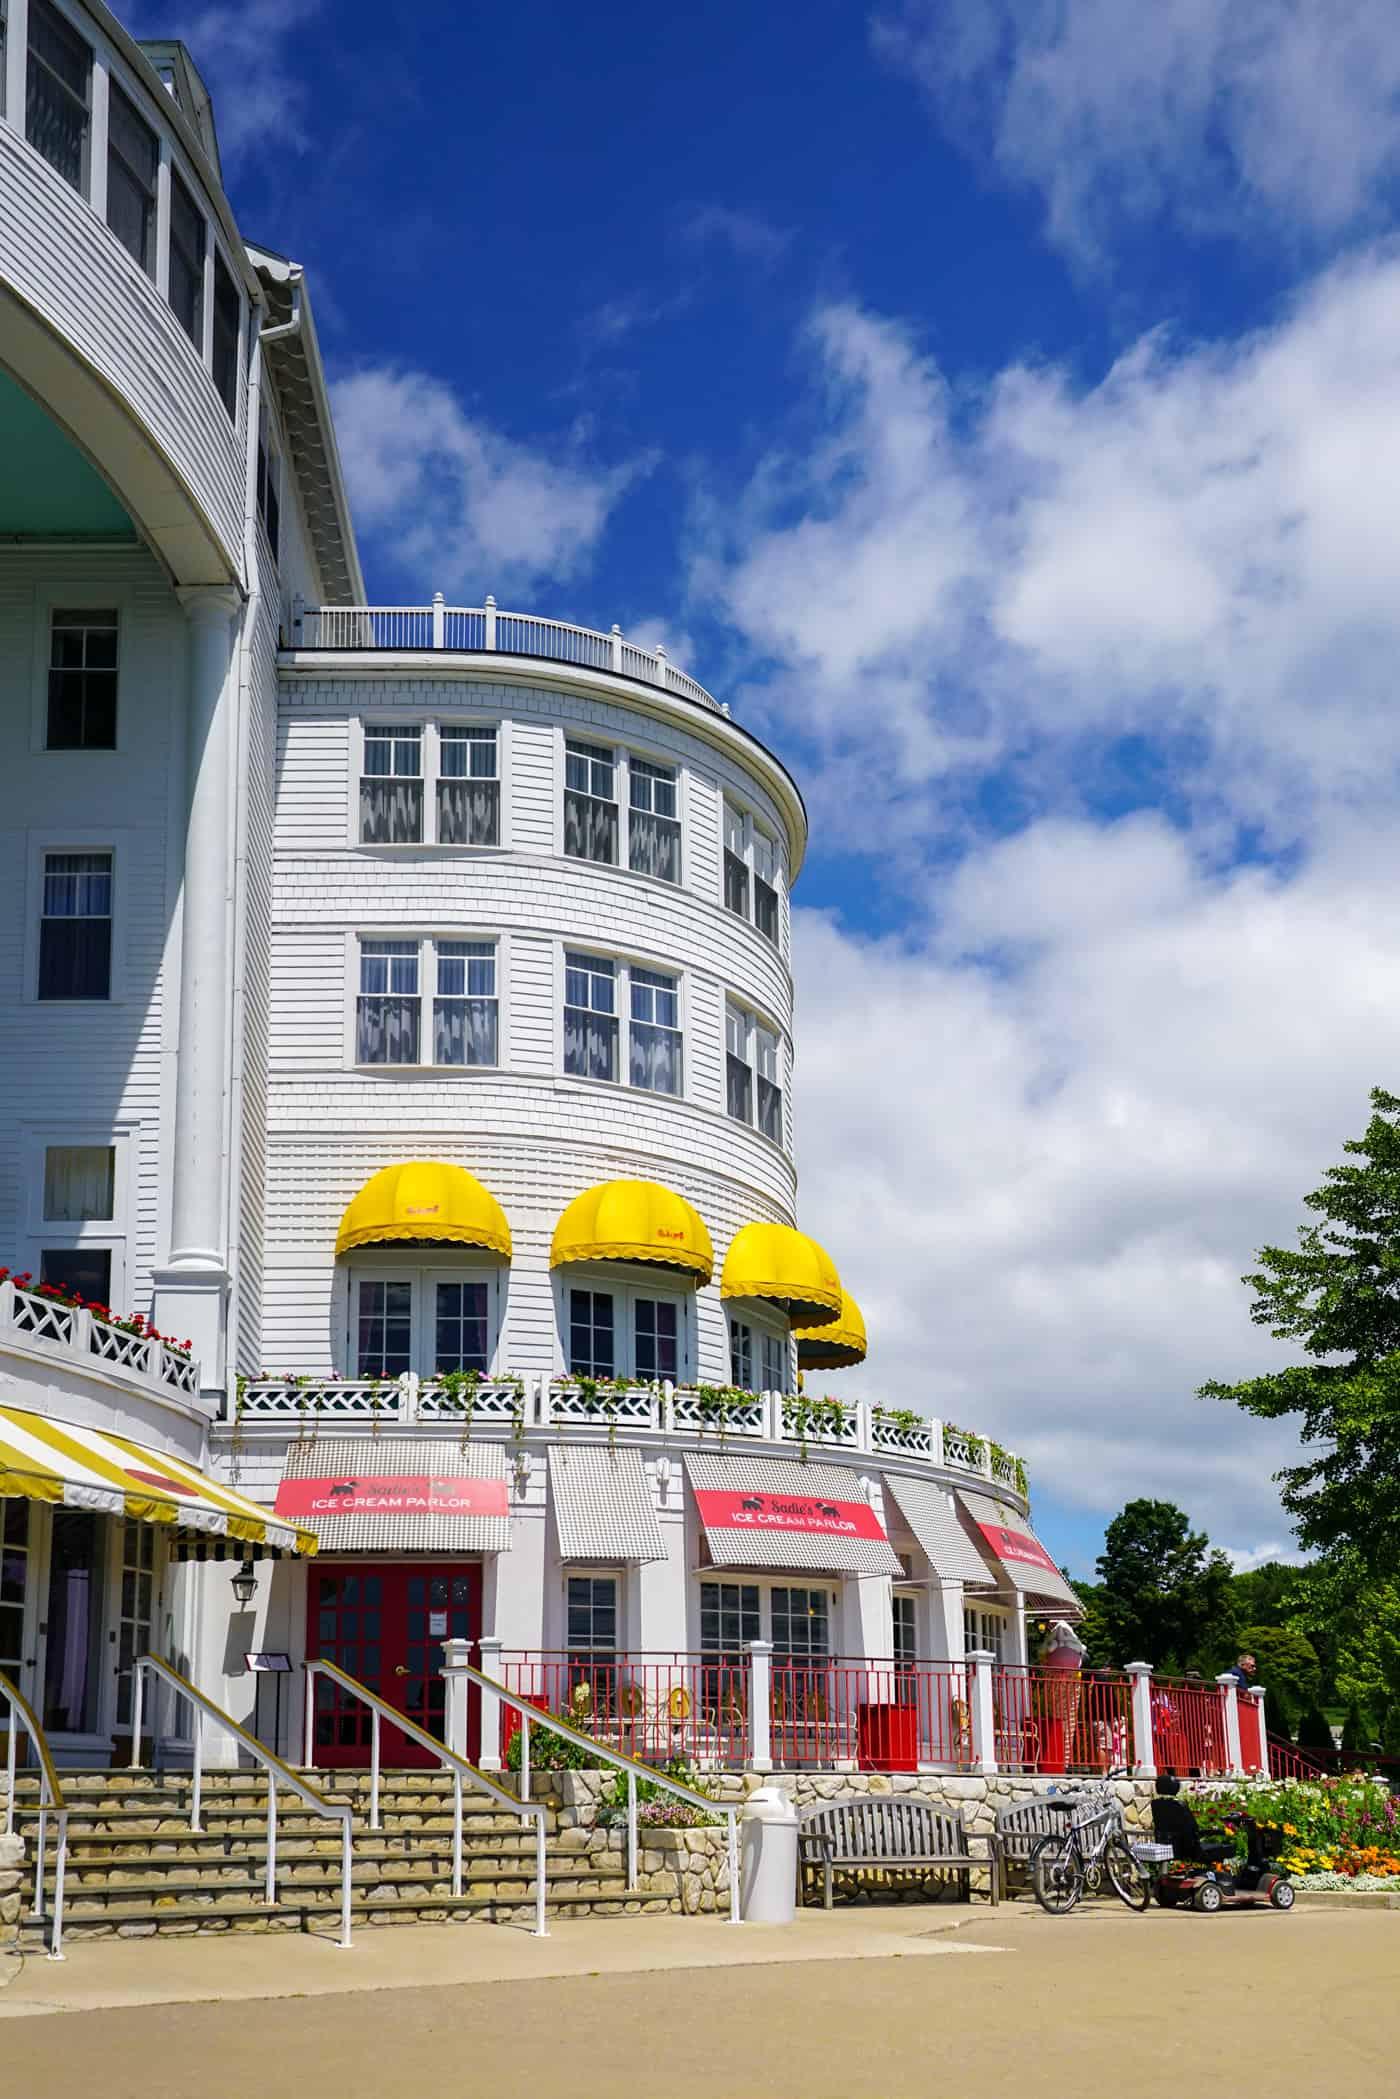 Sadie's Ice Cream Parlor at the Grand Hotel Mackinac Island